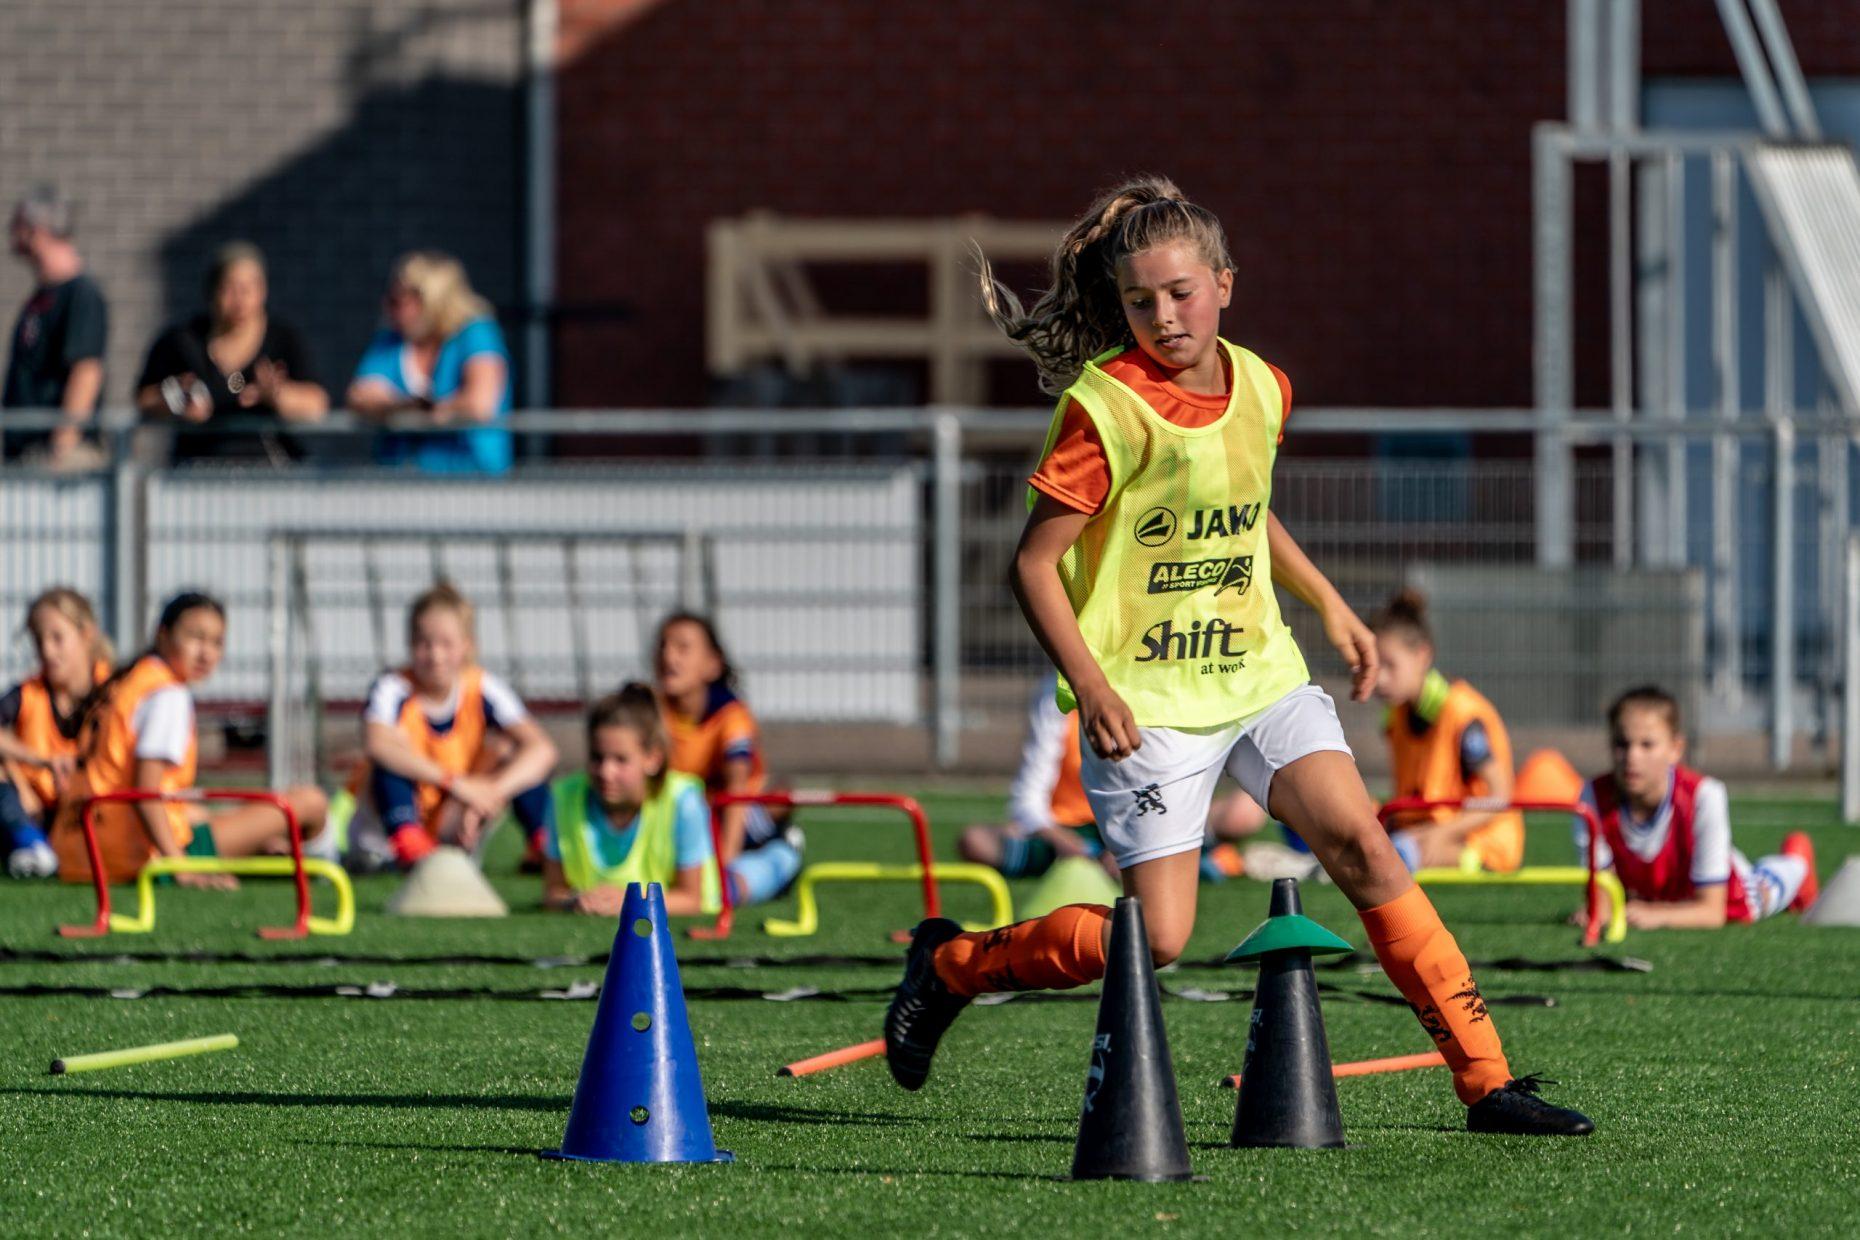 Voetbalschool - Voetbaltalent